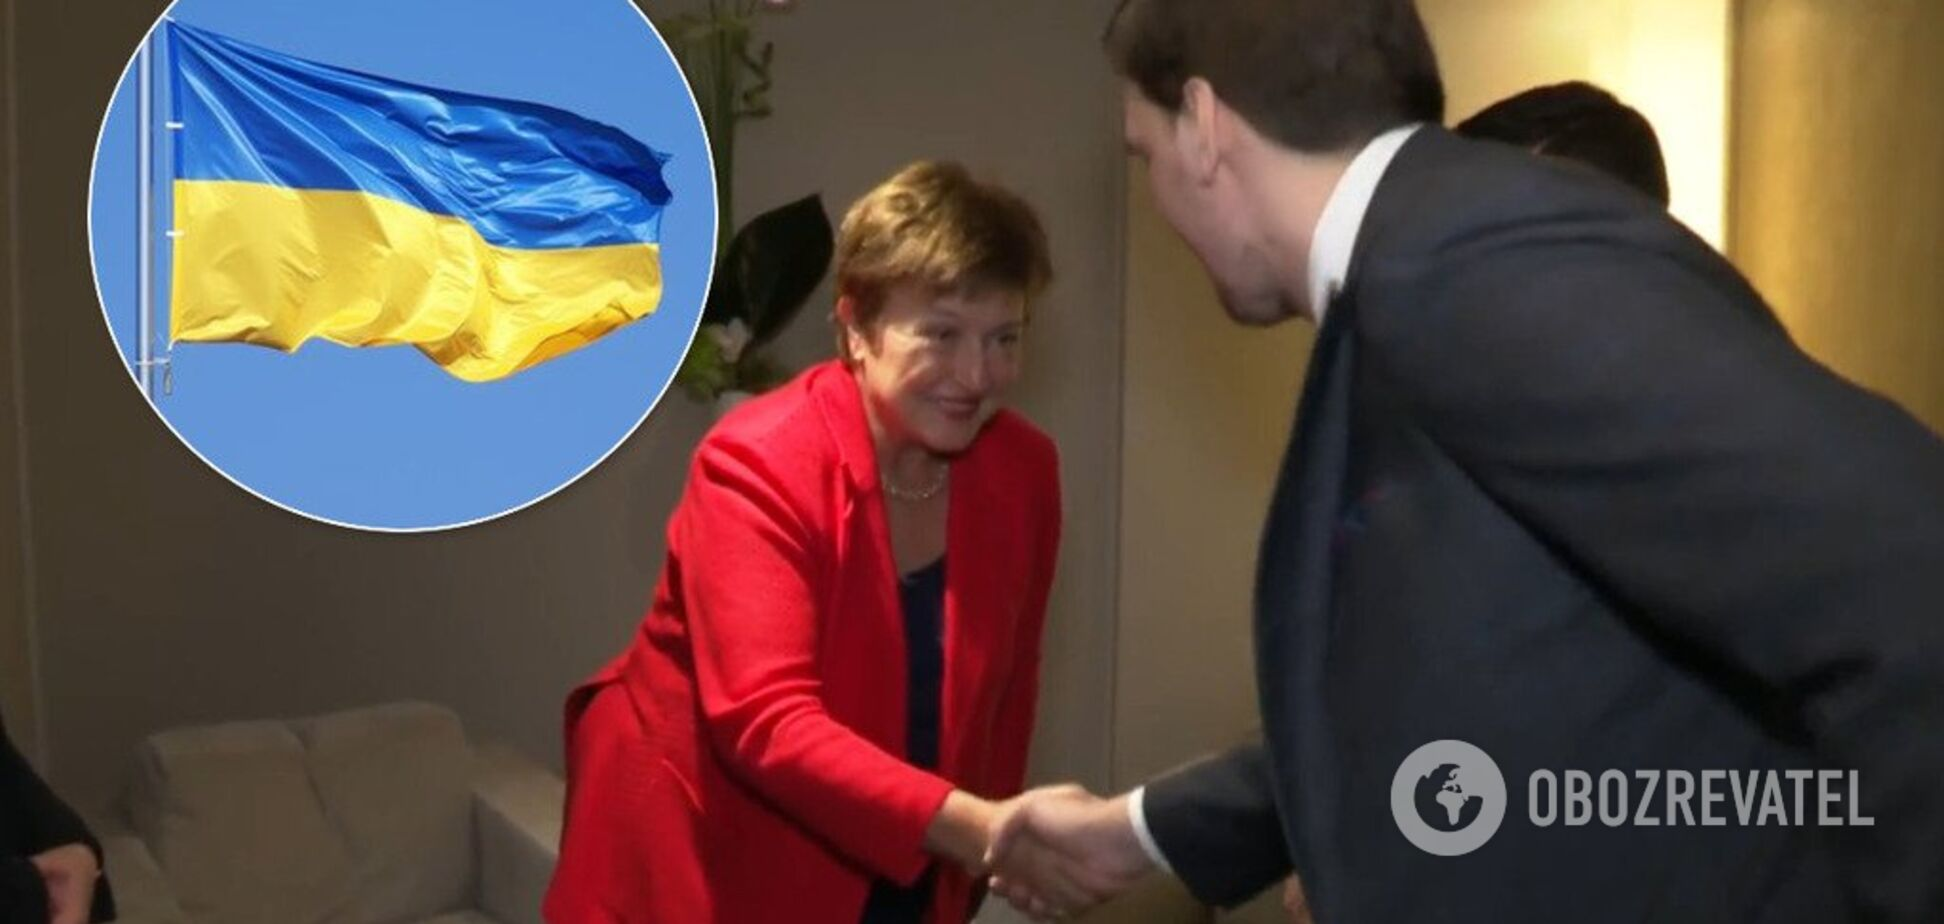 'Шкодую, що не говорю українською': голова МВФ зробила комплімент Гончаруку